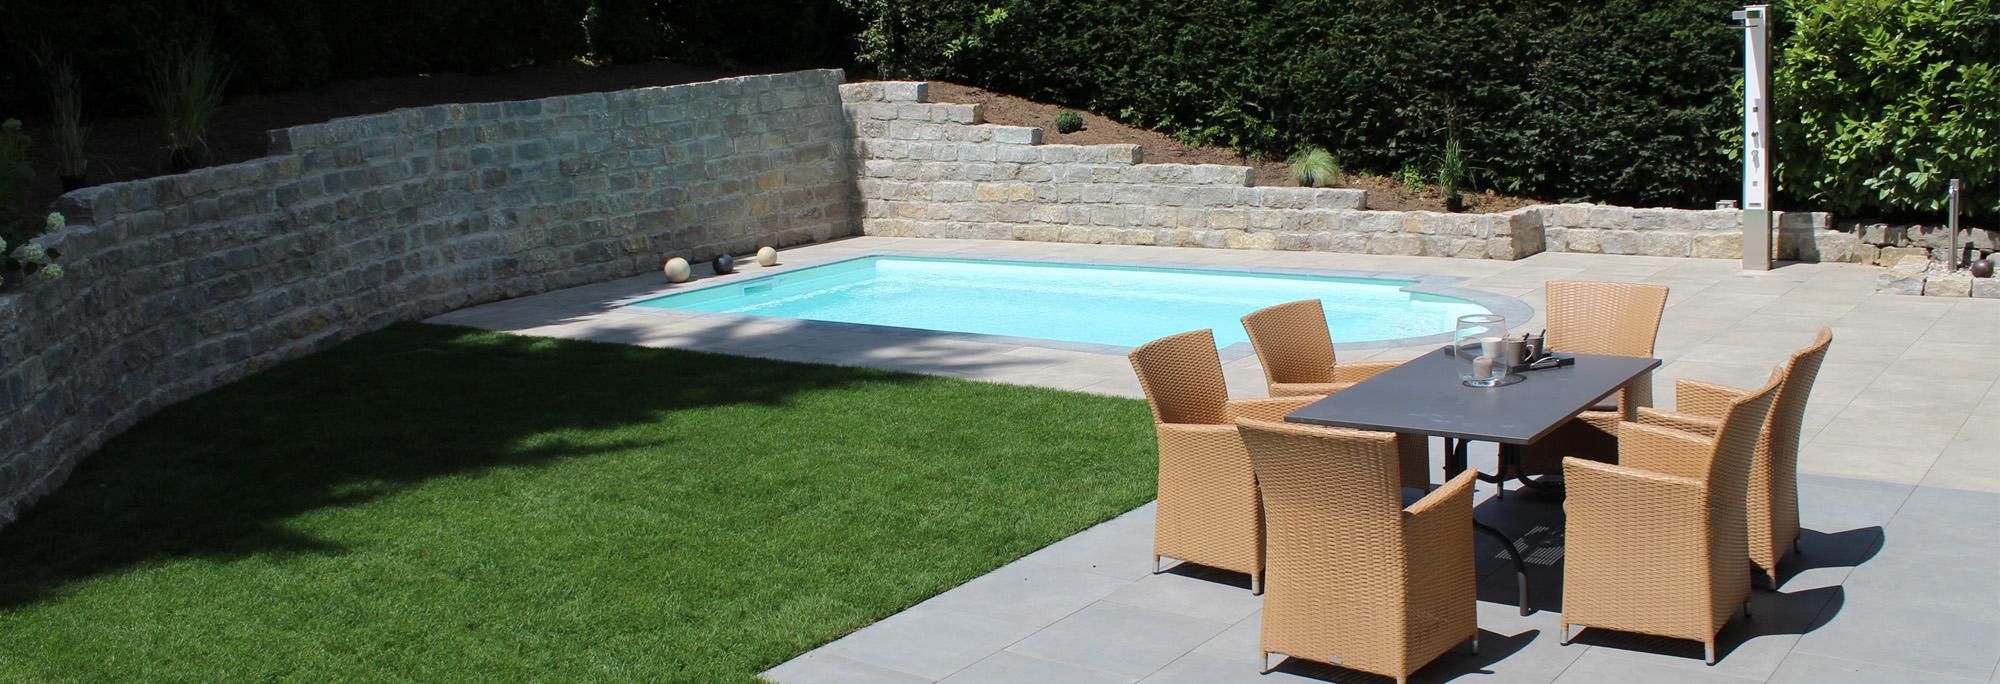 gfk pool kaufen s gfk pool gartenpool mit ausstattung xx top with gfk pool kaufen latest gfk. Black Bedroom Furniture Sets. Home Design Ideas